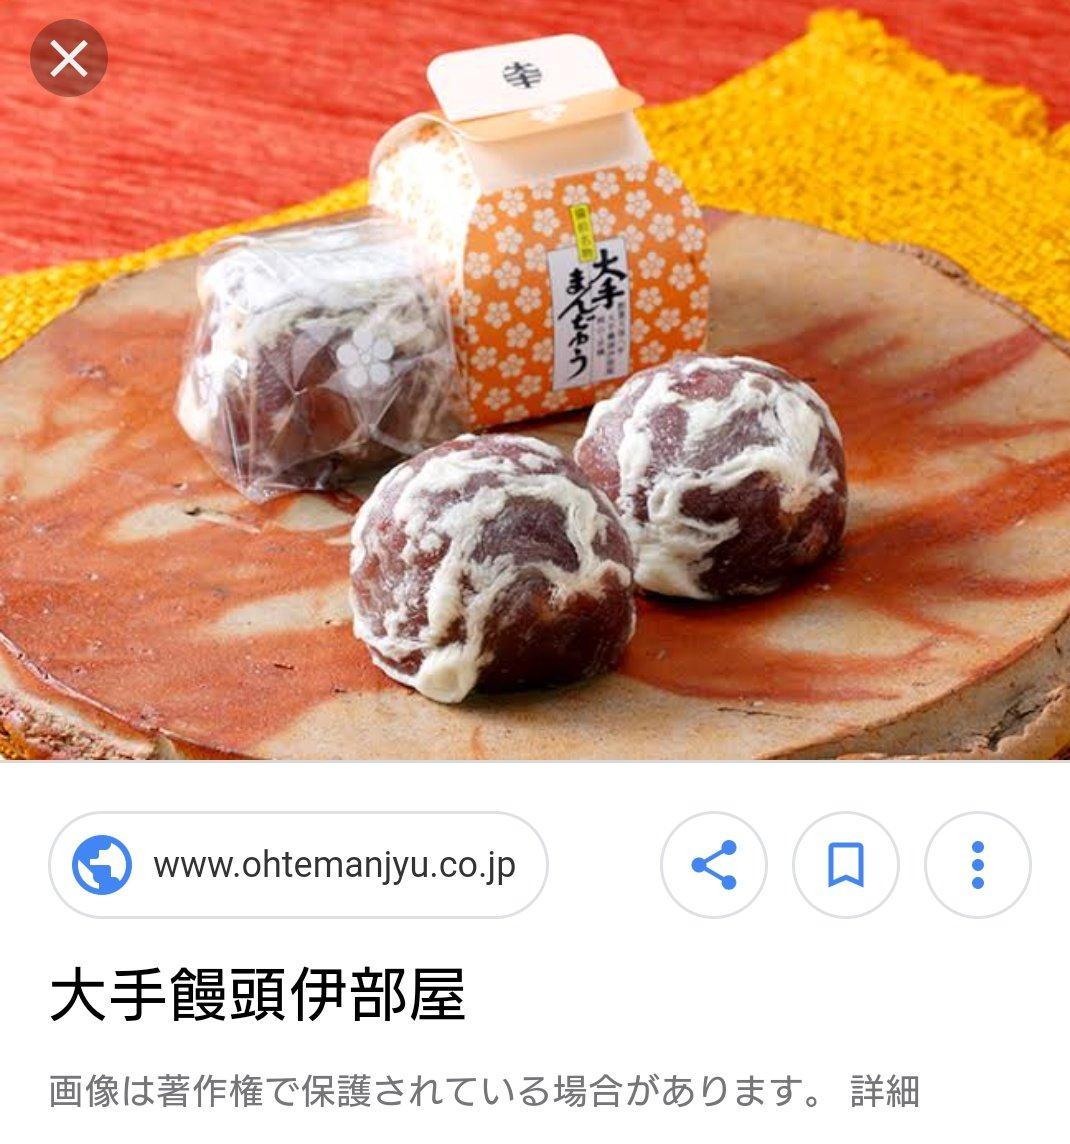 test ツイッターメディア - 岡山へお越しの際 お土産の1番押しは、 大手饅頭伊部屋の  「大手まんじゅう」 日本3大饅頭の1つです! https://t.co/1LFeDGFRQZ